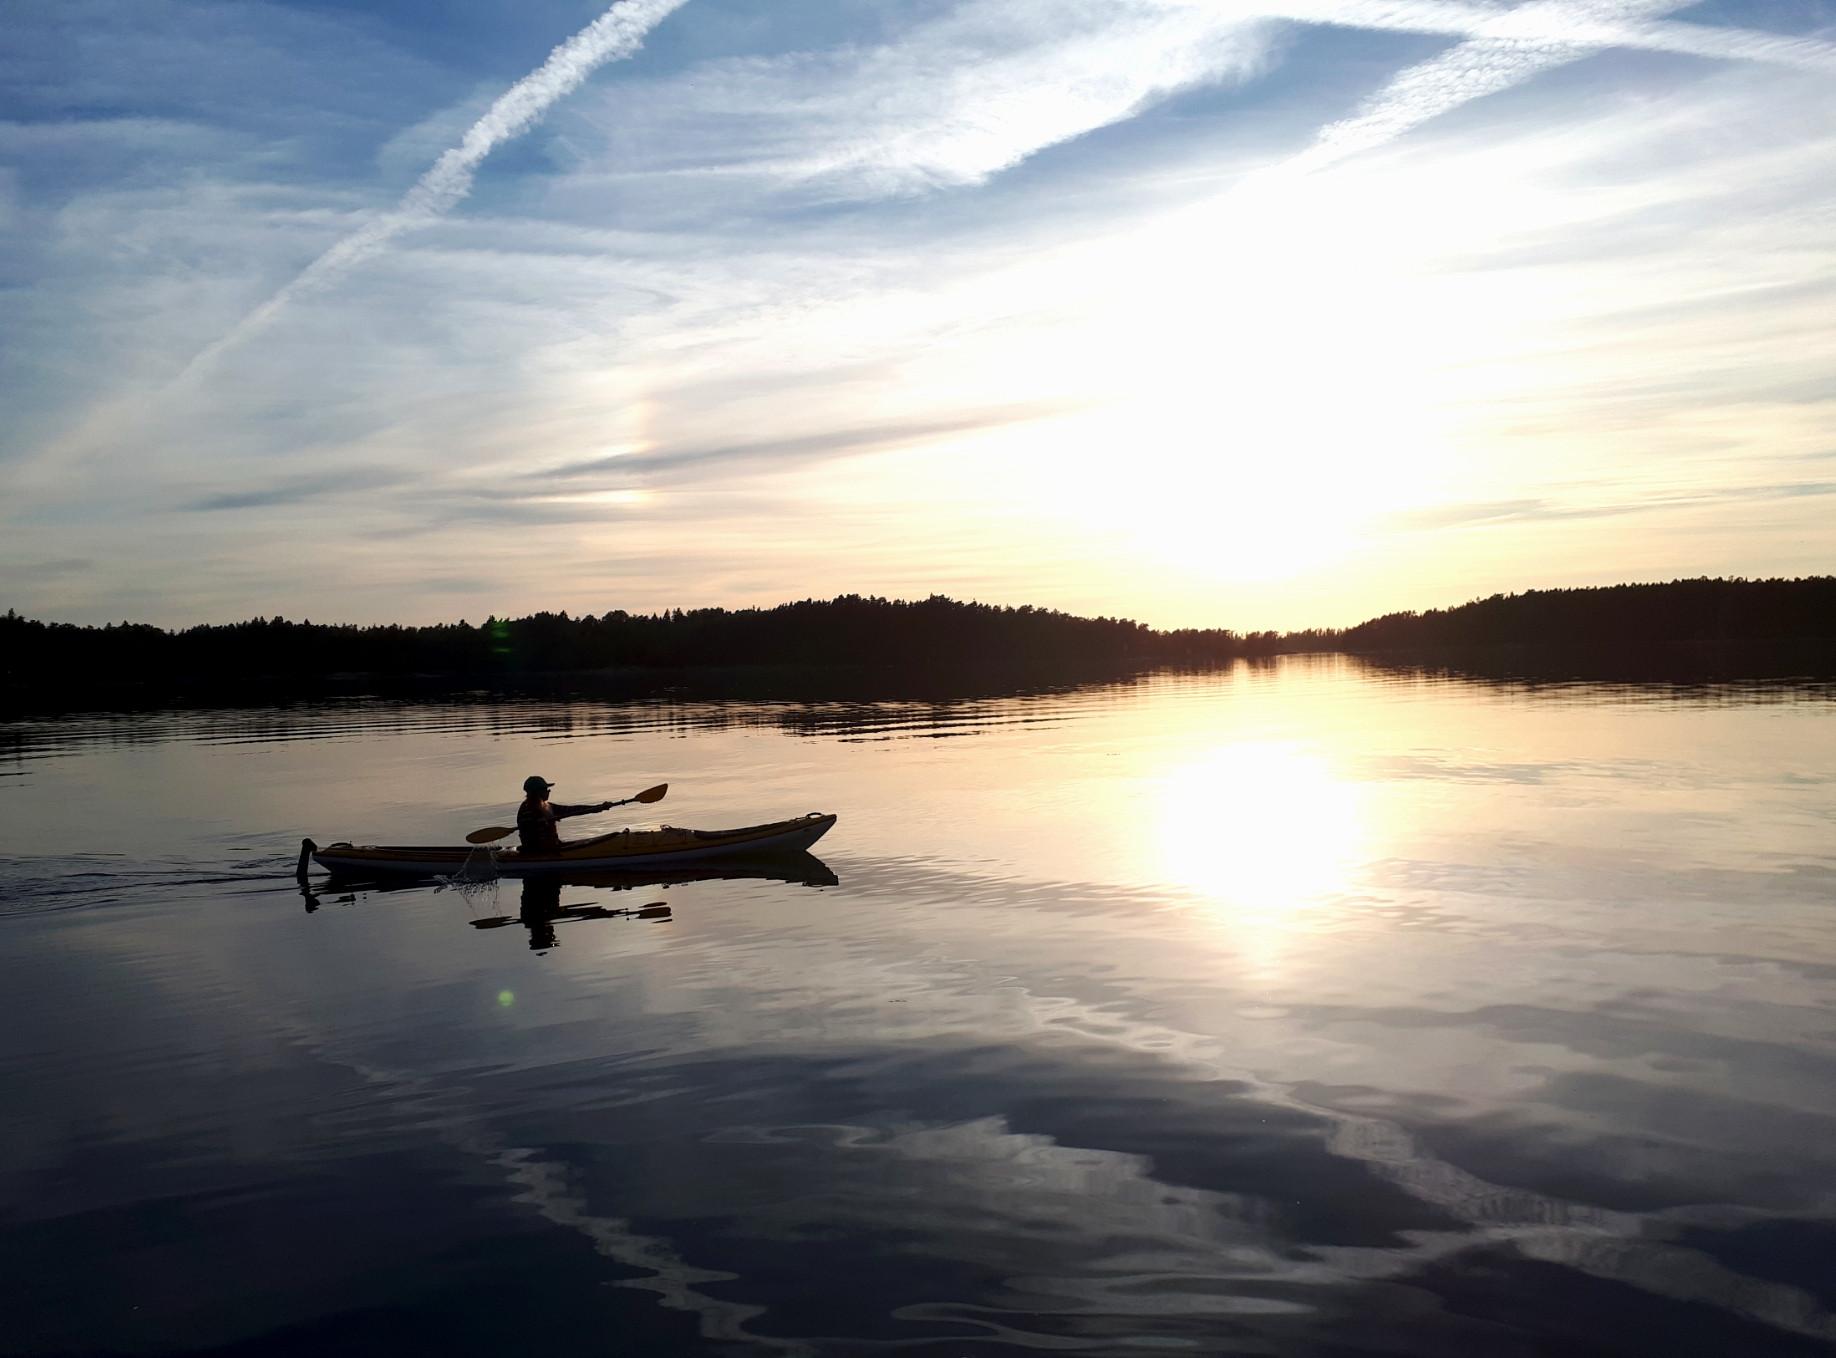 Afternoon kayaking in Archipelago